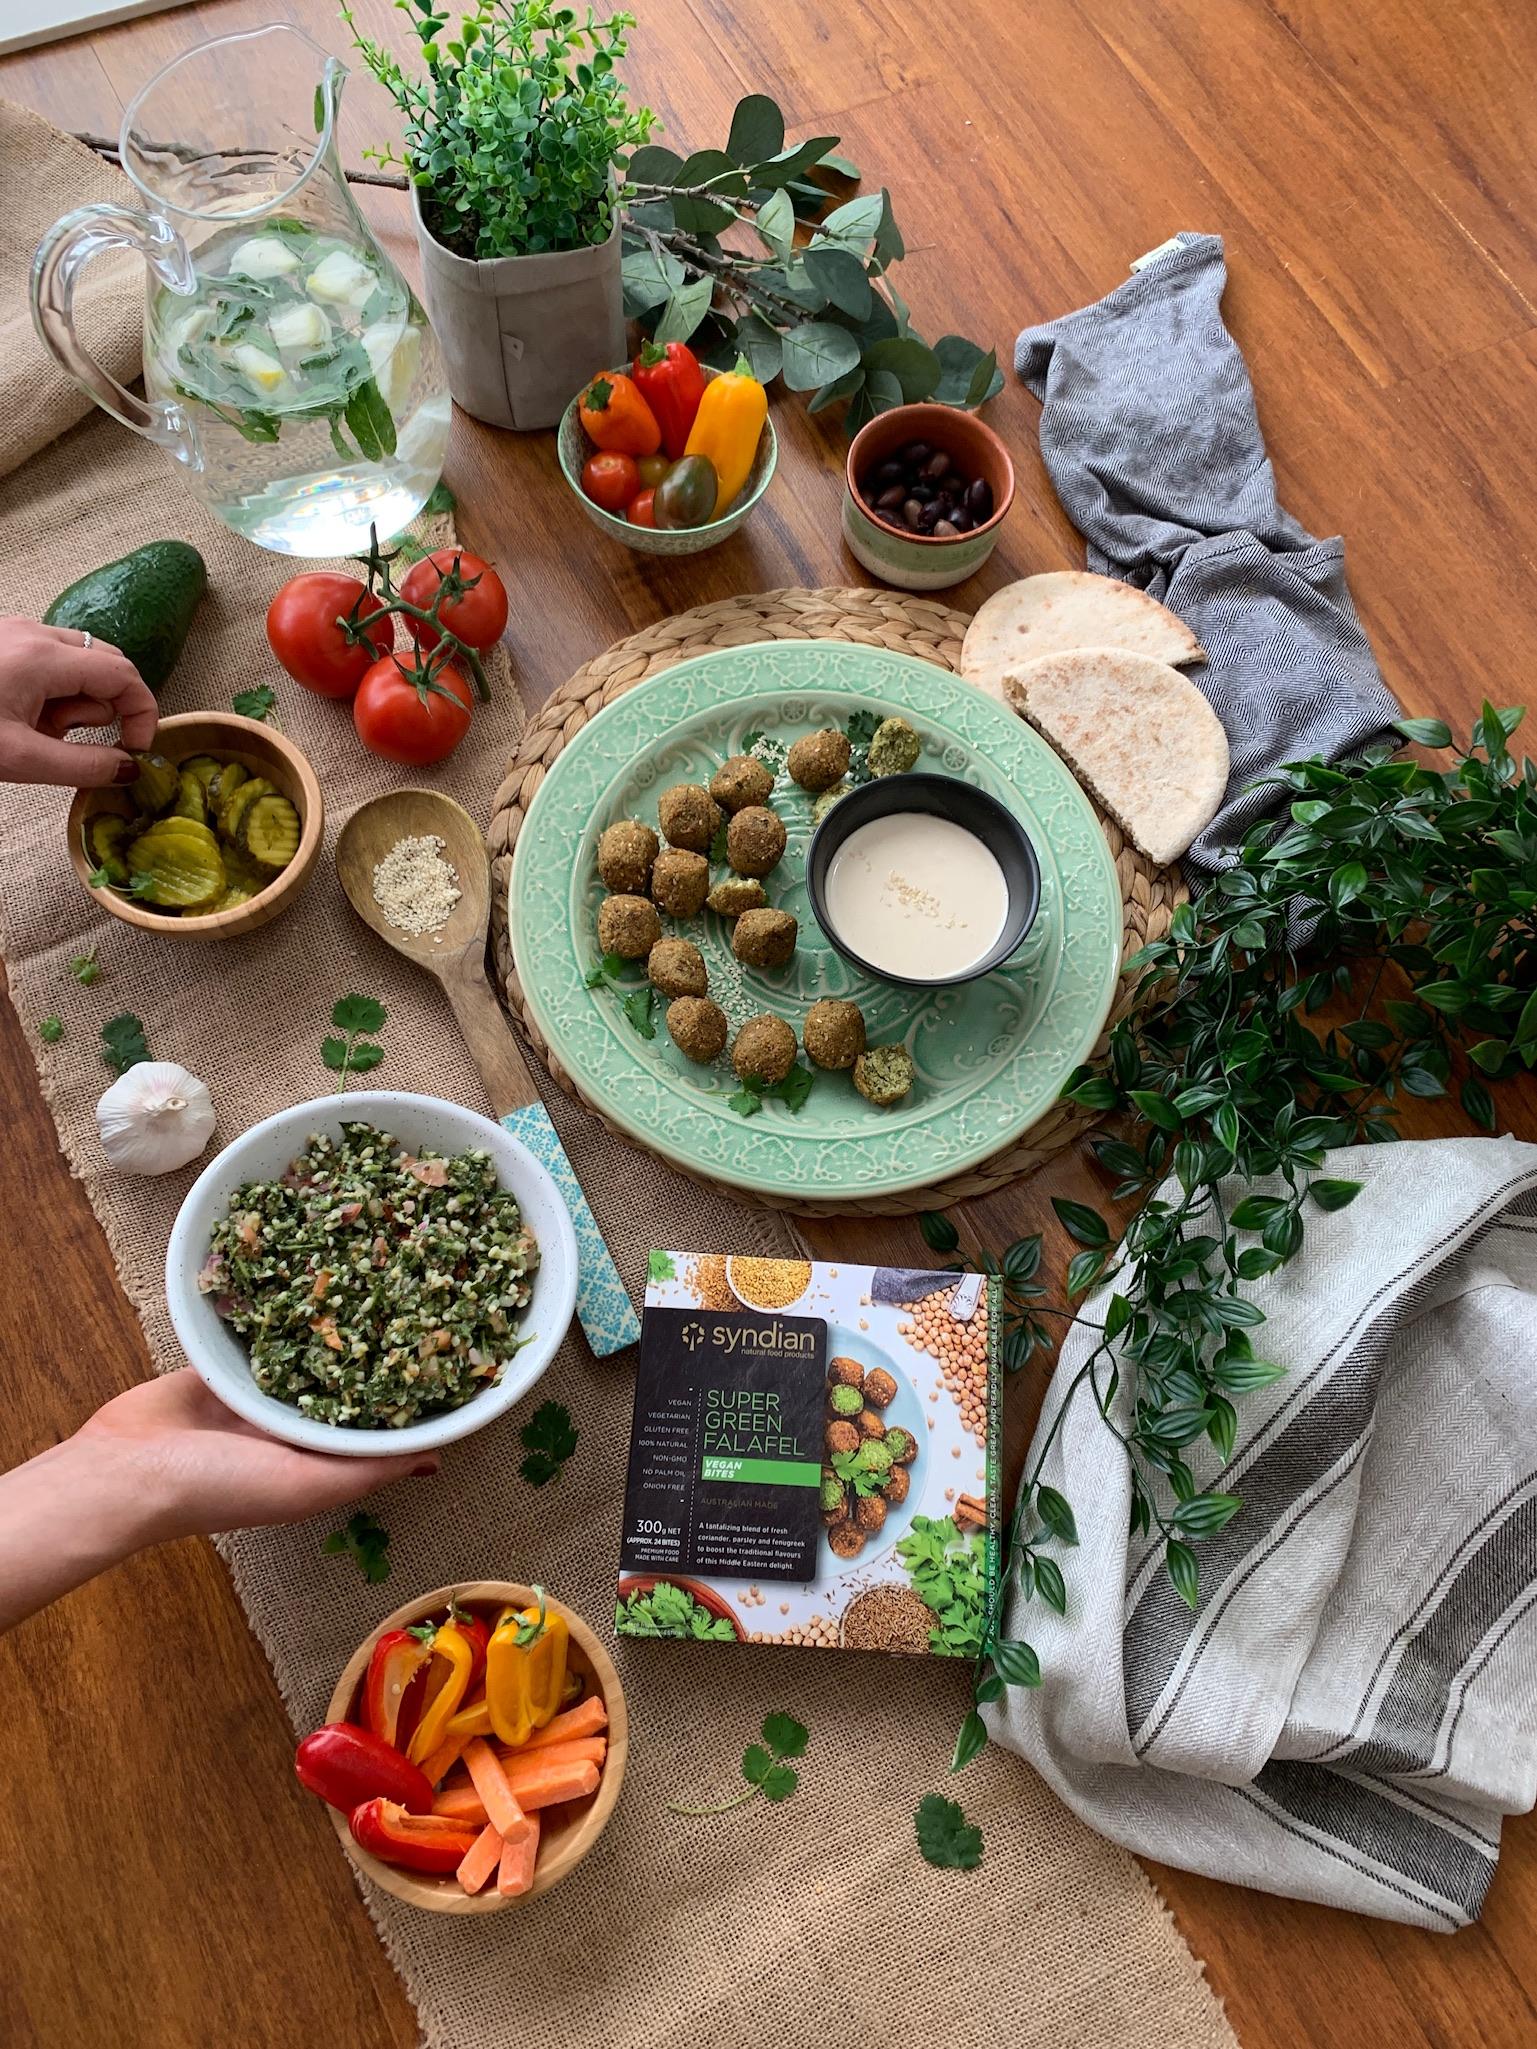 Syndian Natural Food celebrate 20 years of amazing vegan food